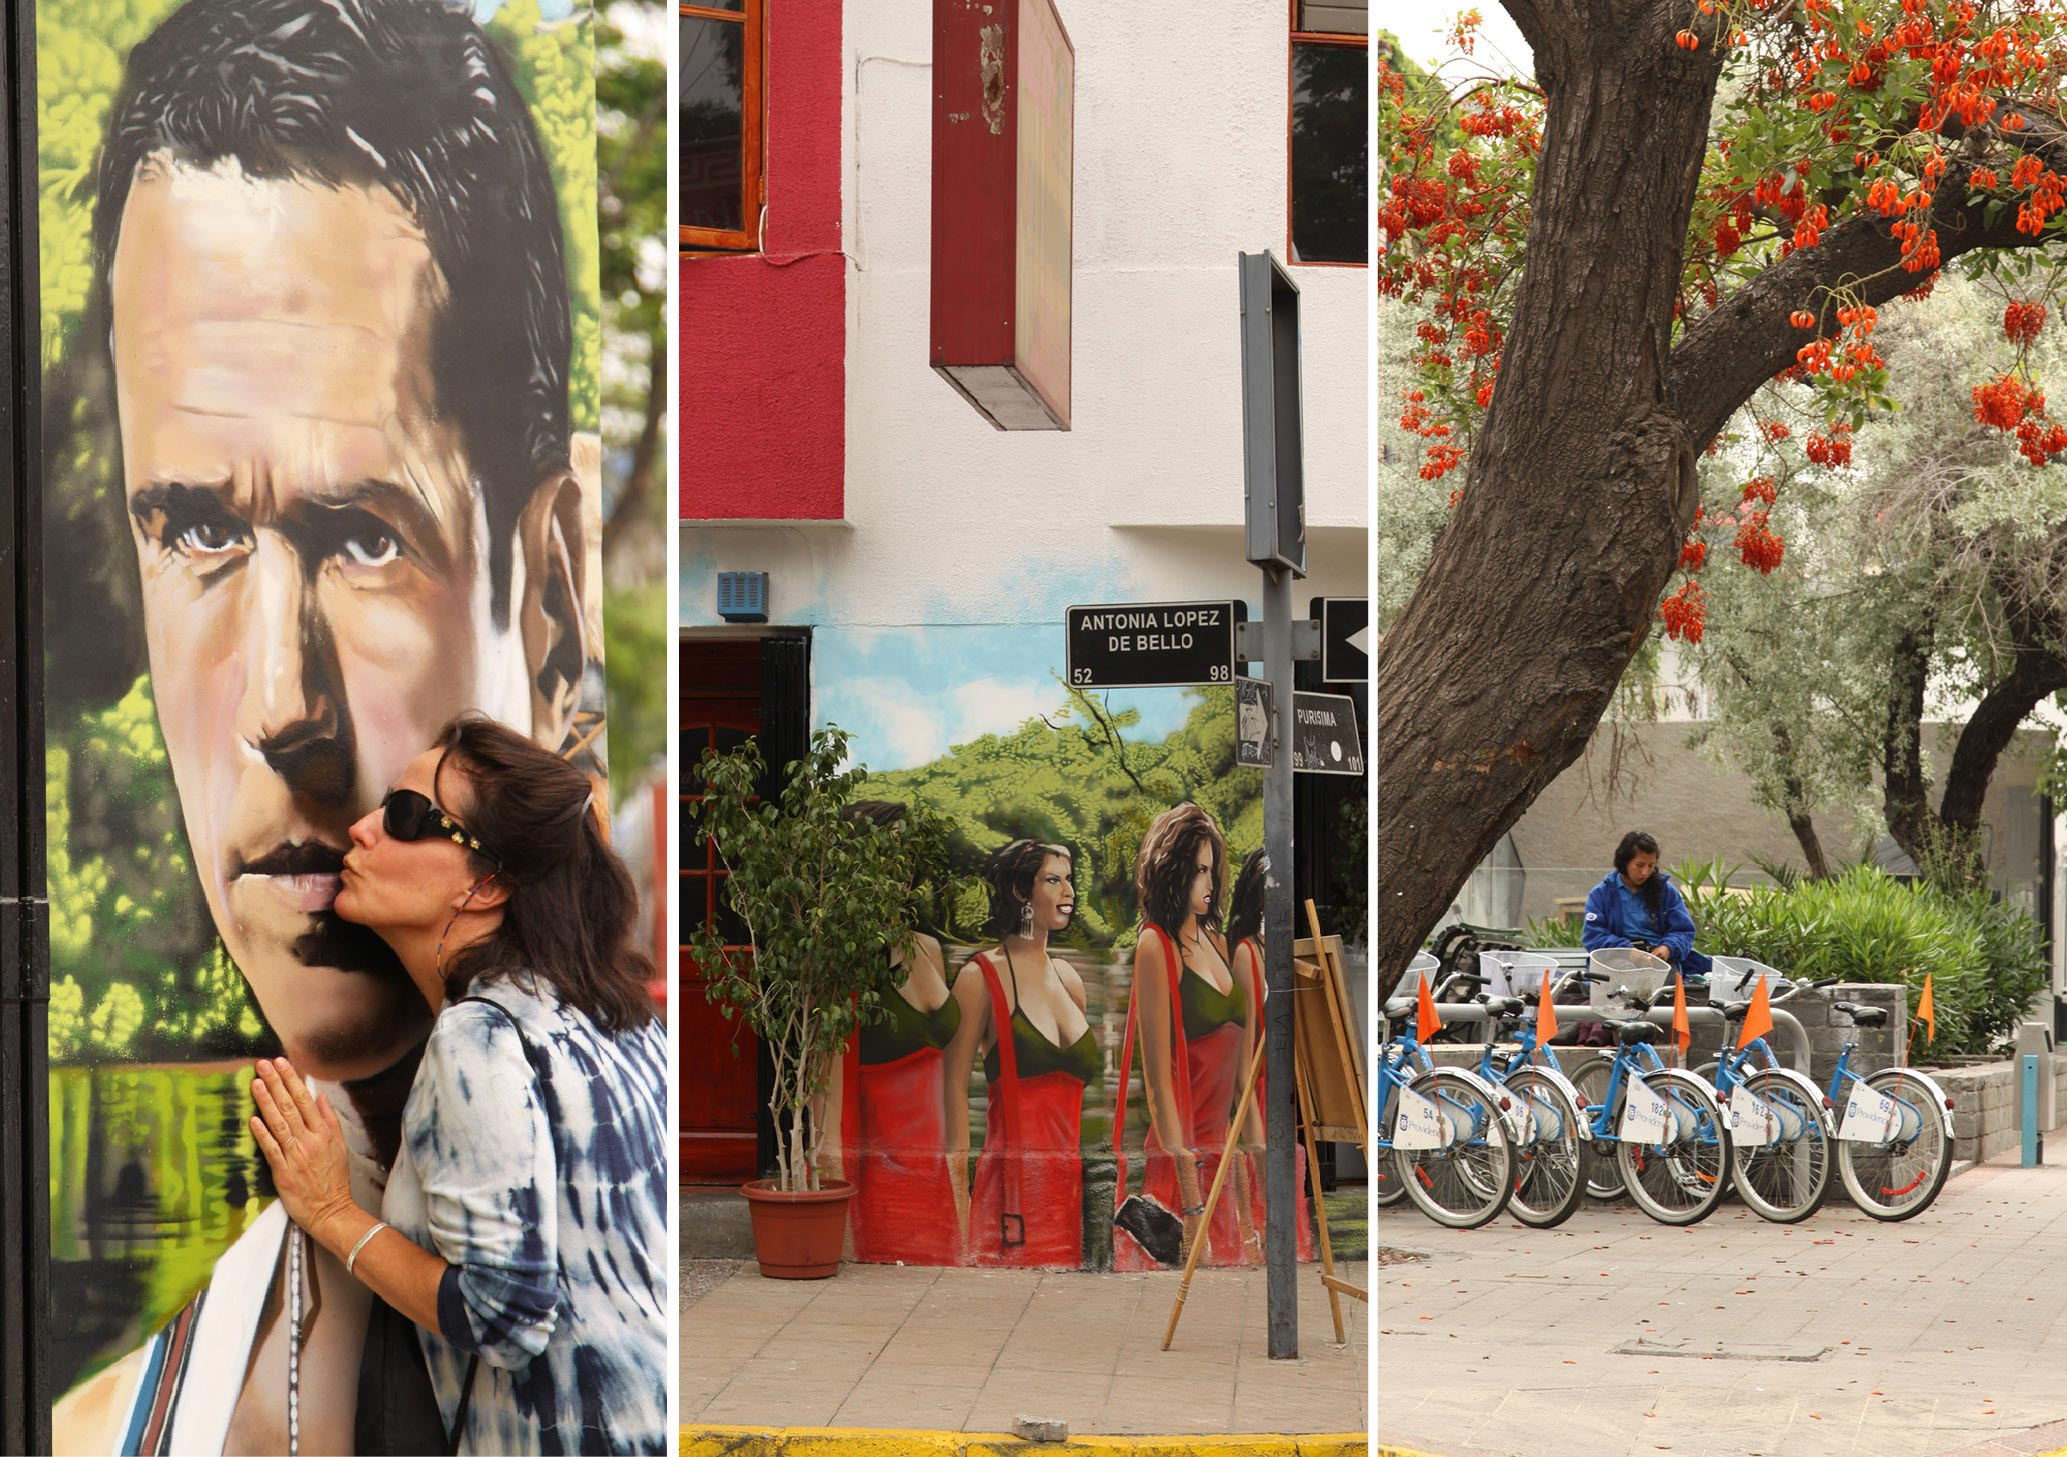 streets-of-santiago-1